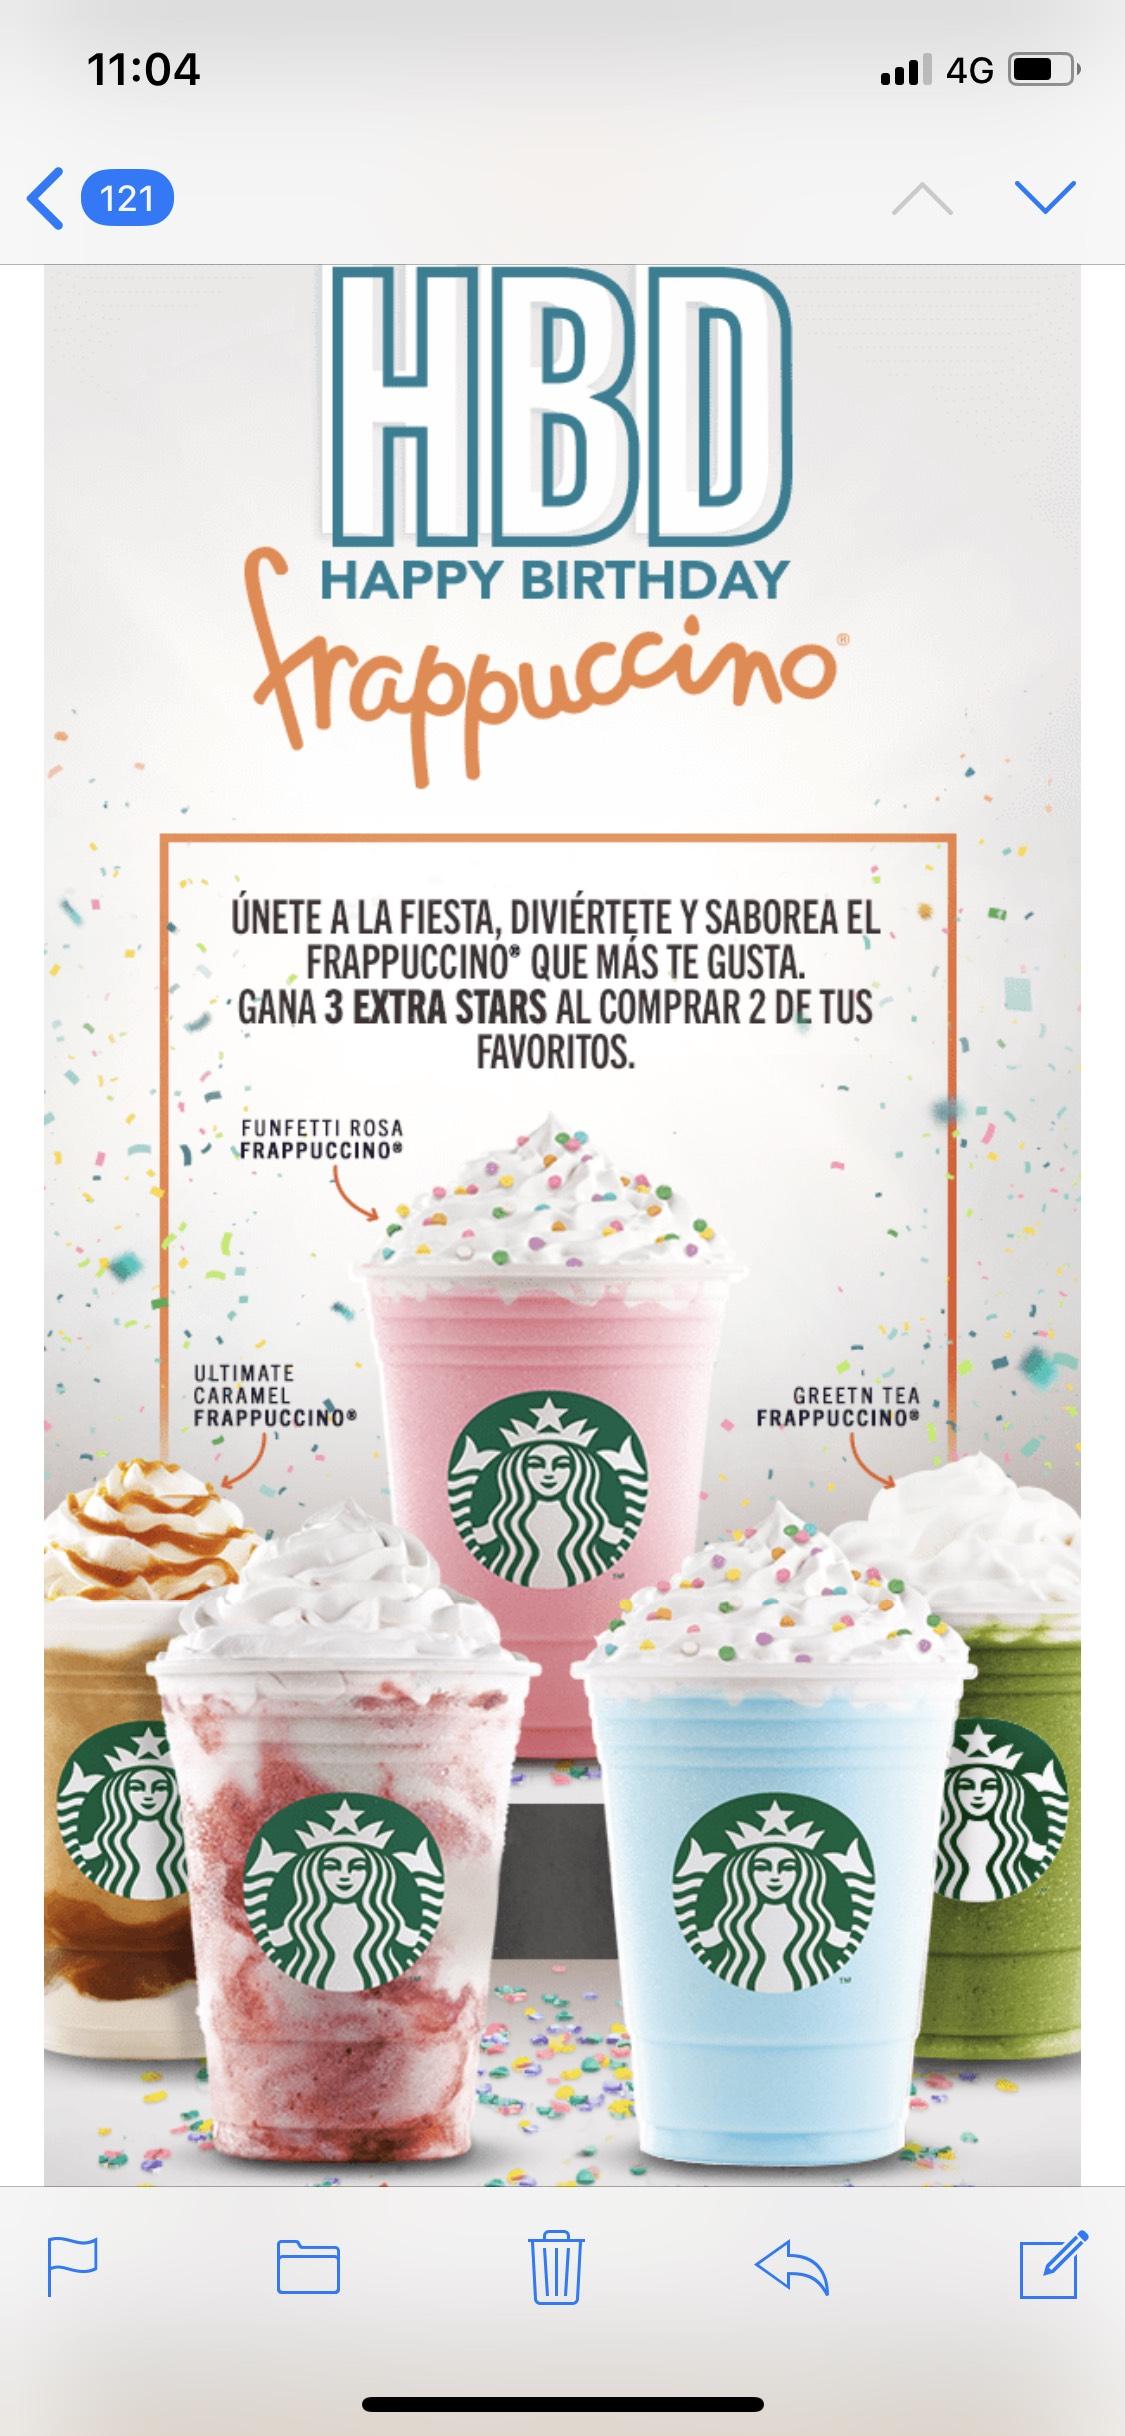 Starbucks: 3 stars al comprar 2 frapuccinos